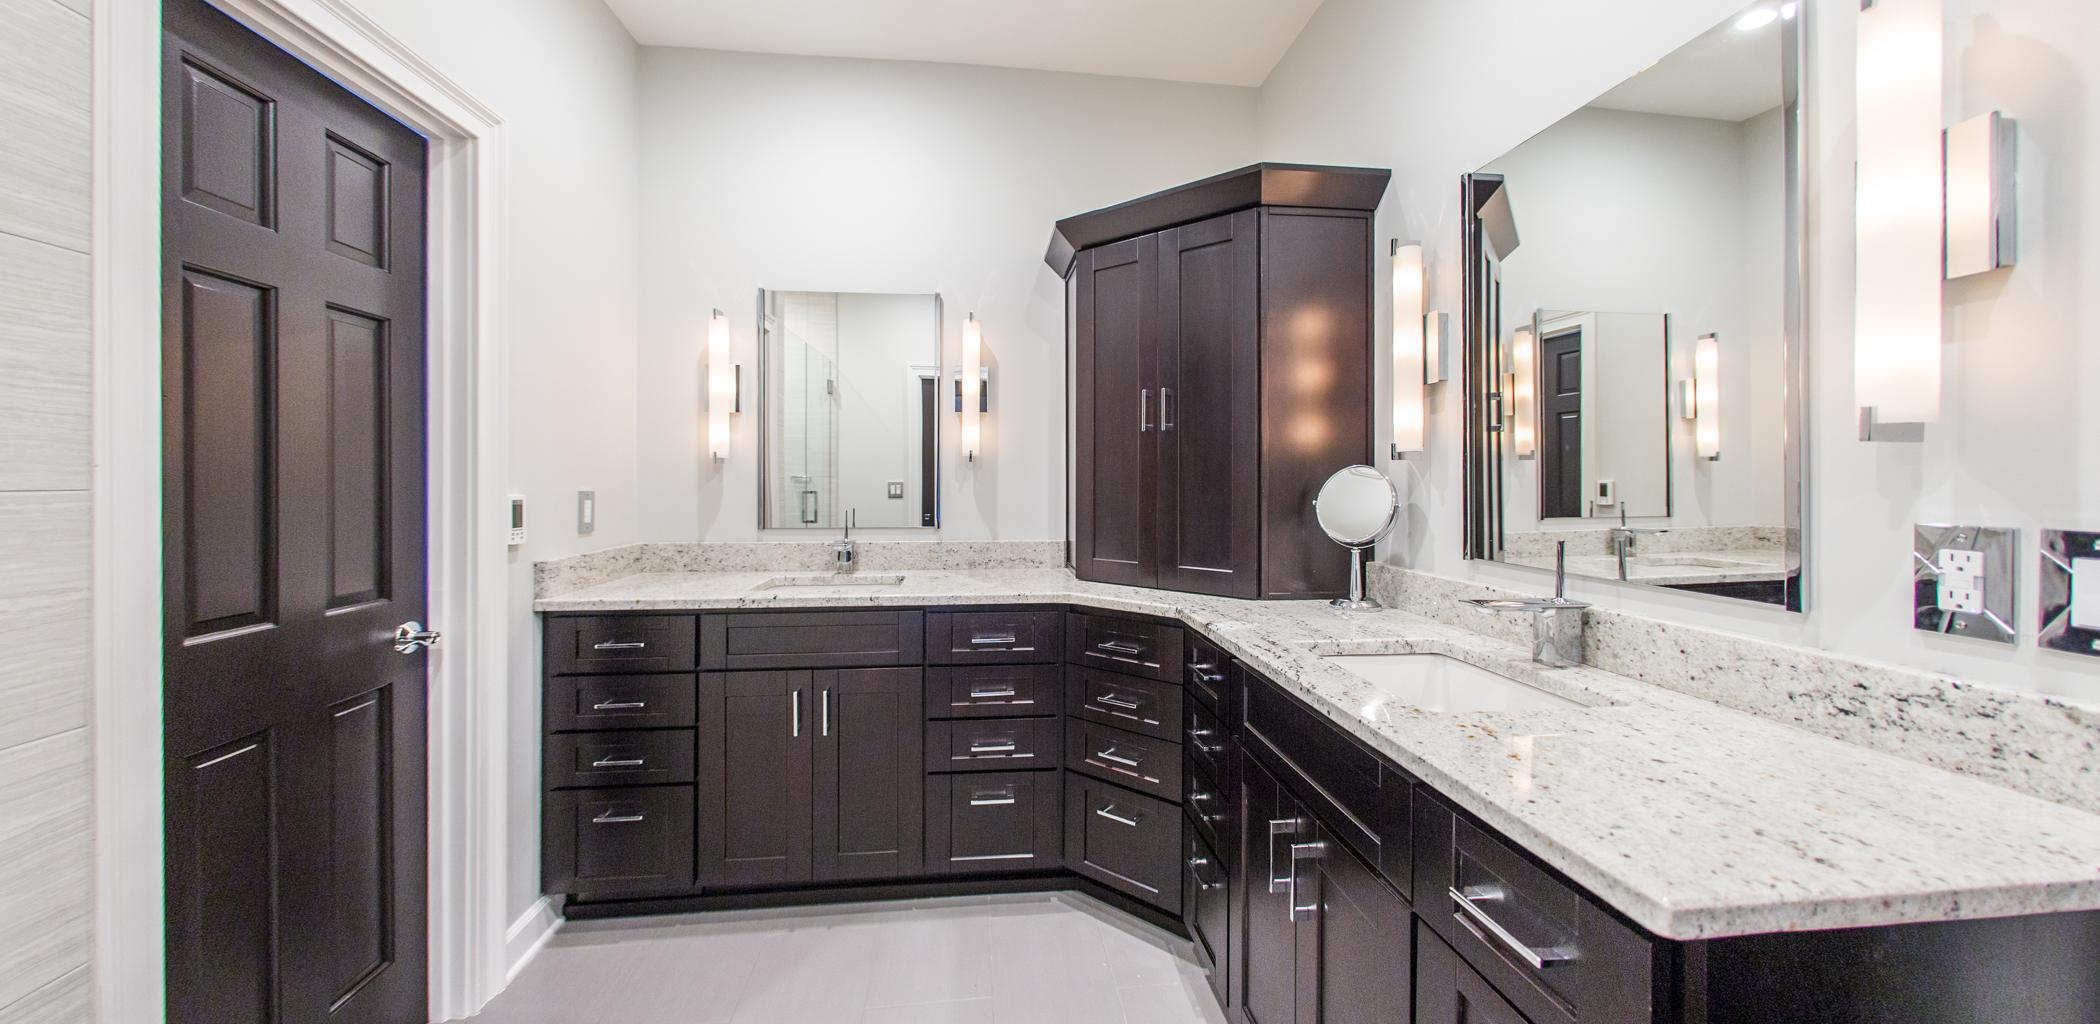 Customer Bathroom Remodel